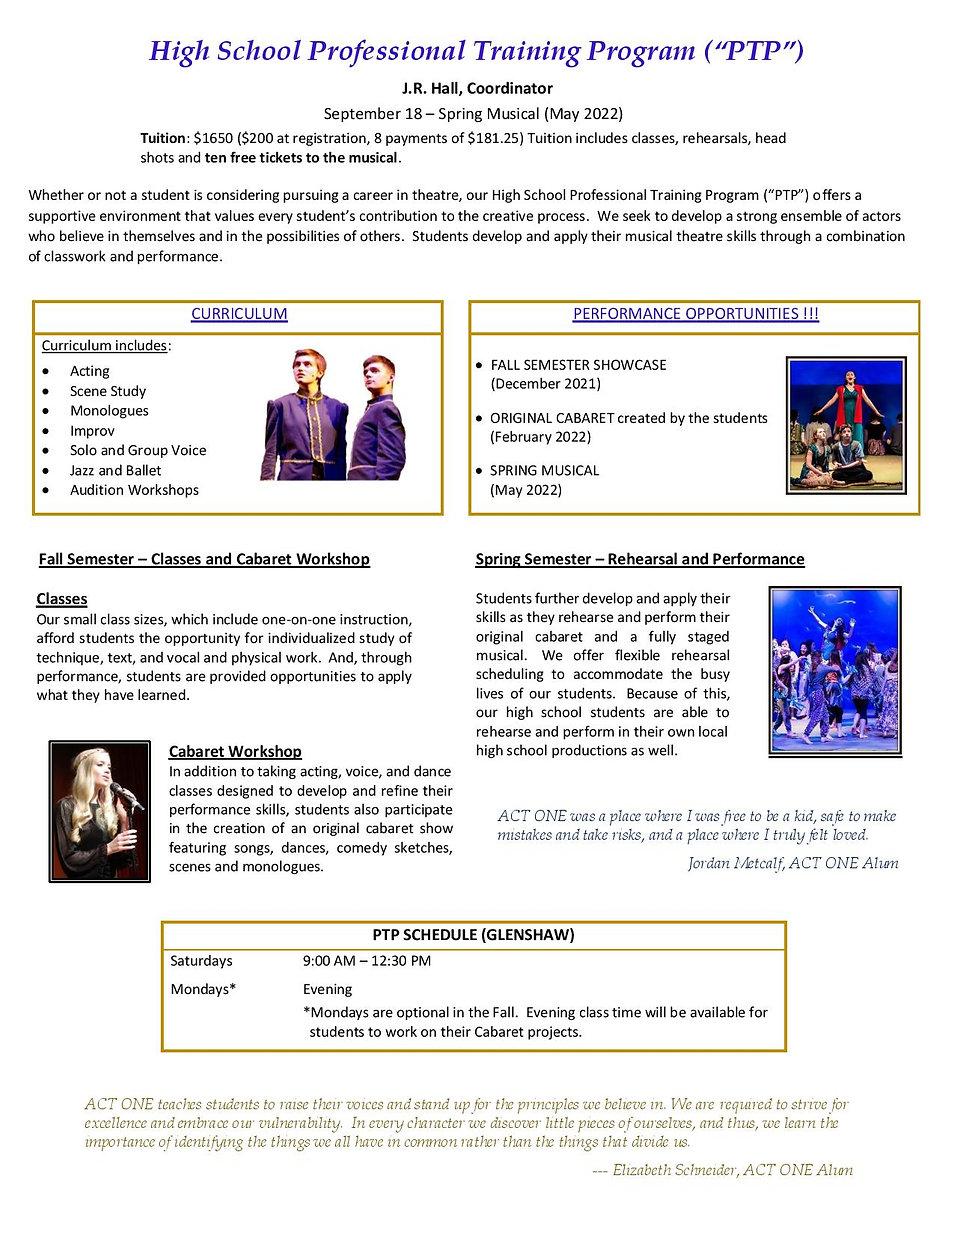 2021-2022 Act One Brochure 7-23-21 - Website Full-page-002.jpg